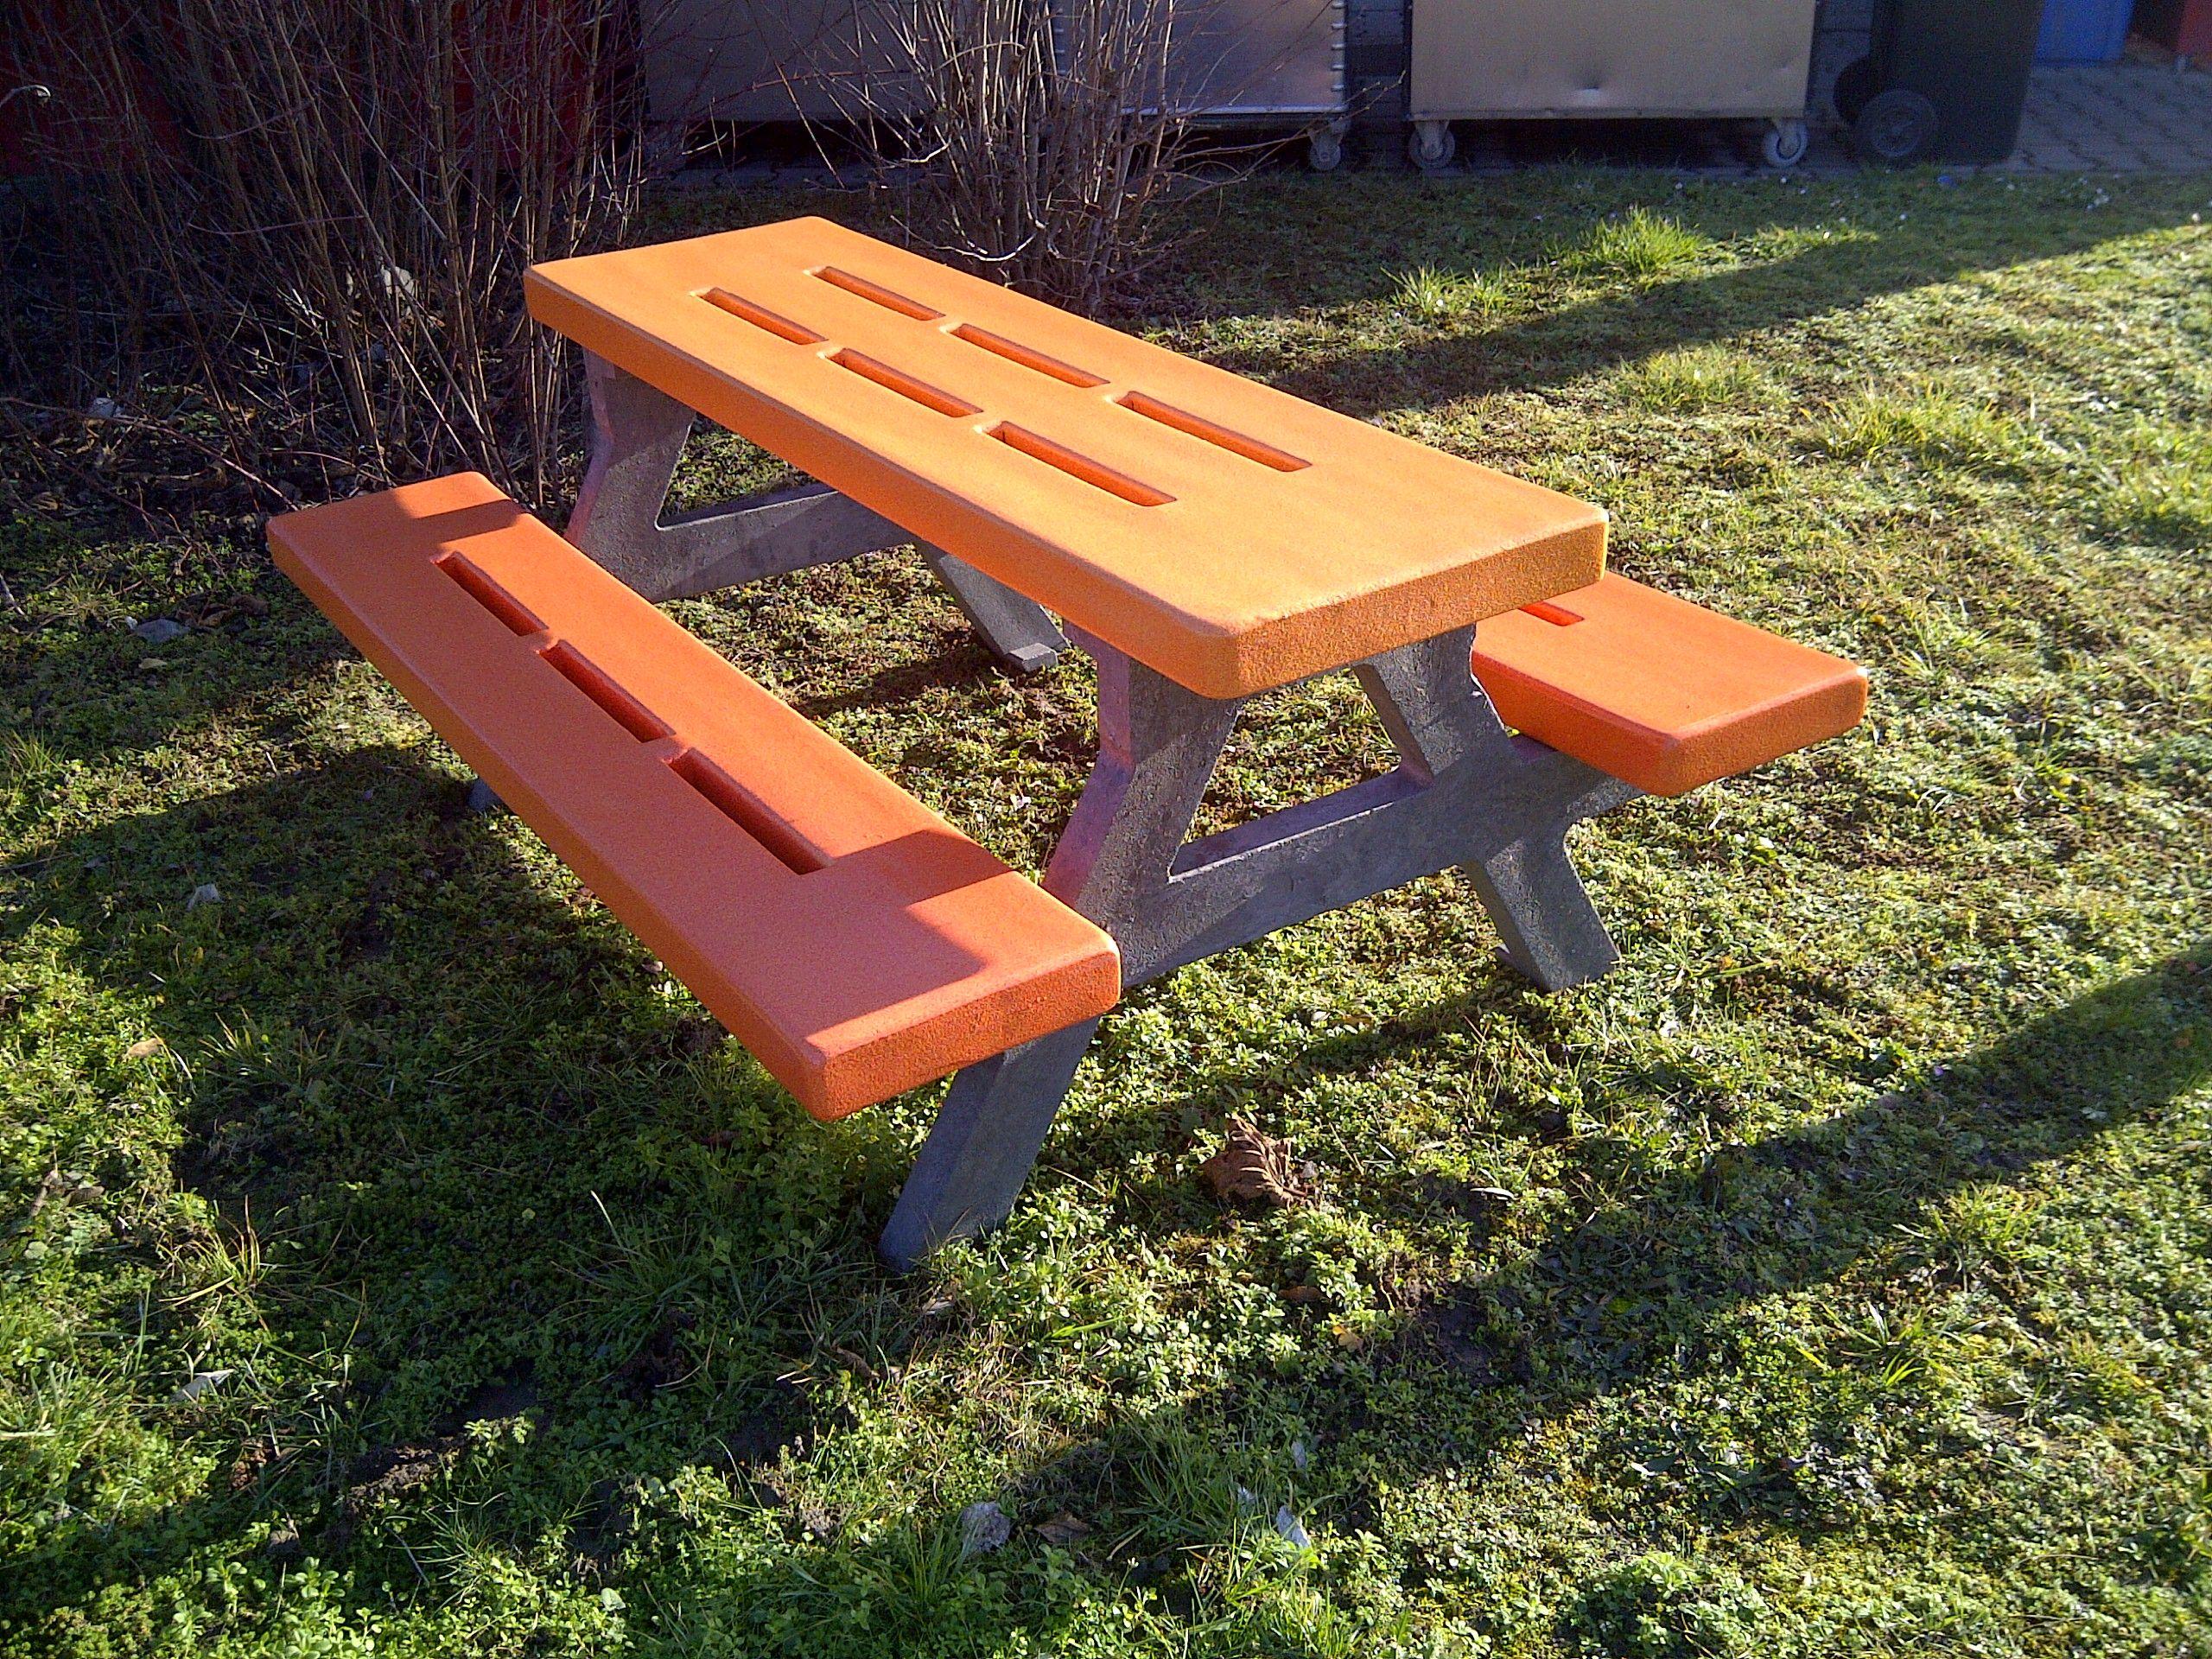 REKU Kinder-Tischbank WKOO 150 einfarbig